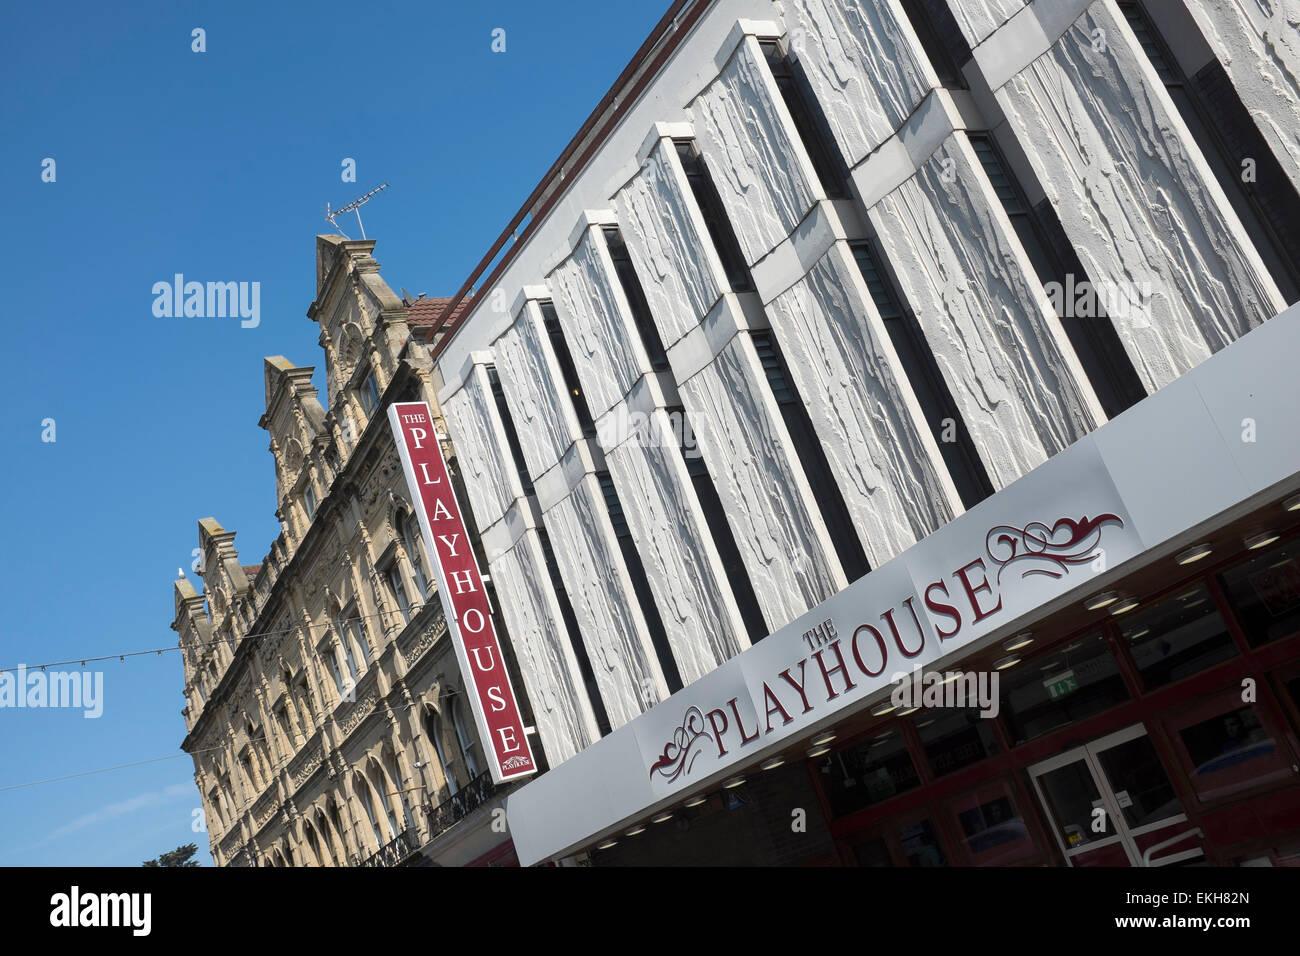 The Playhouse Theatre in Weston Super Mare - Stock Image